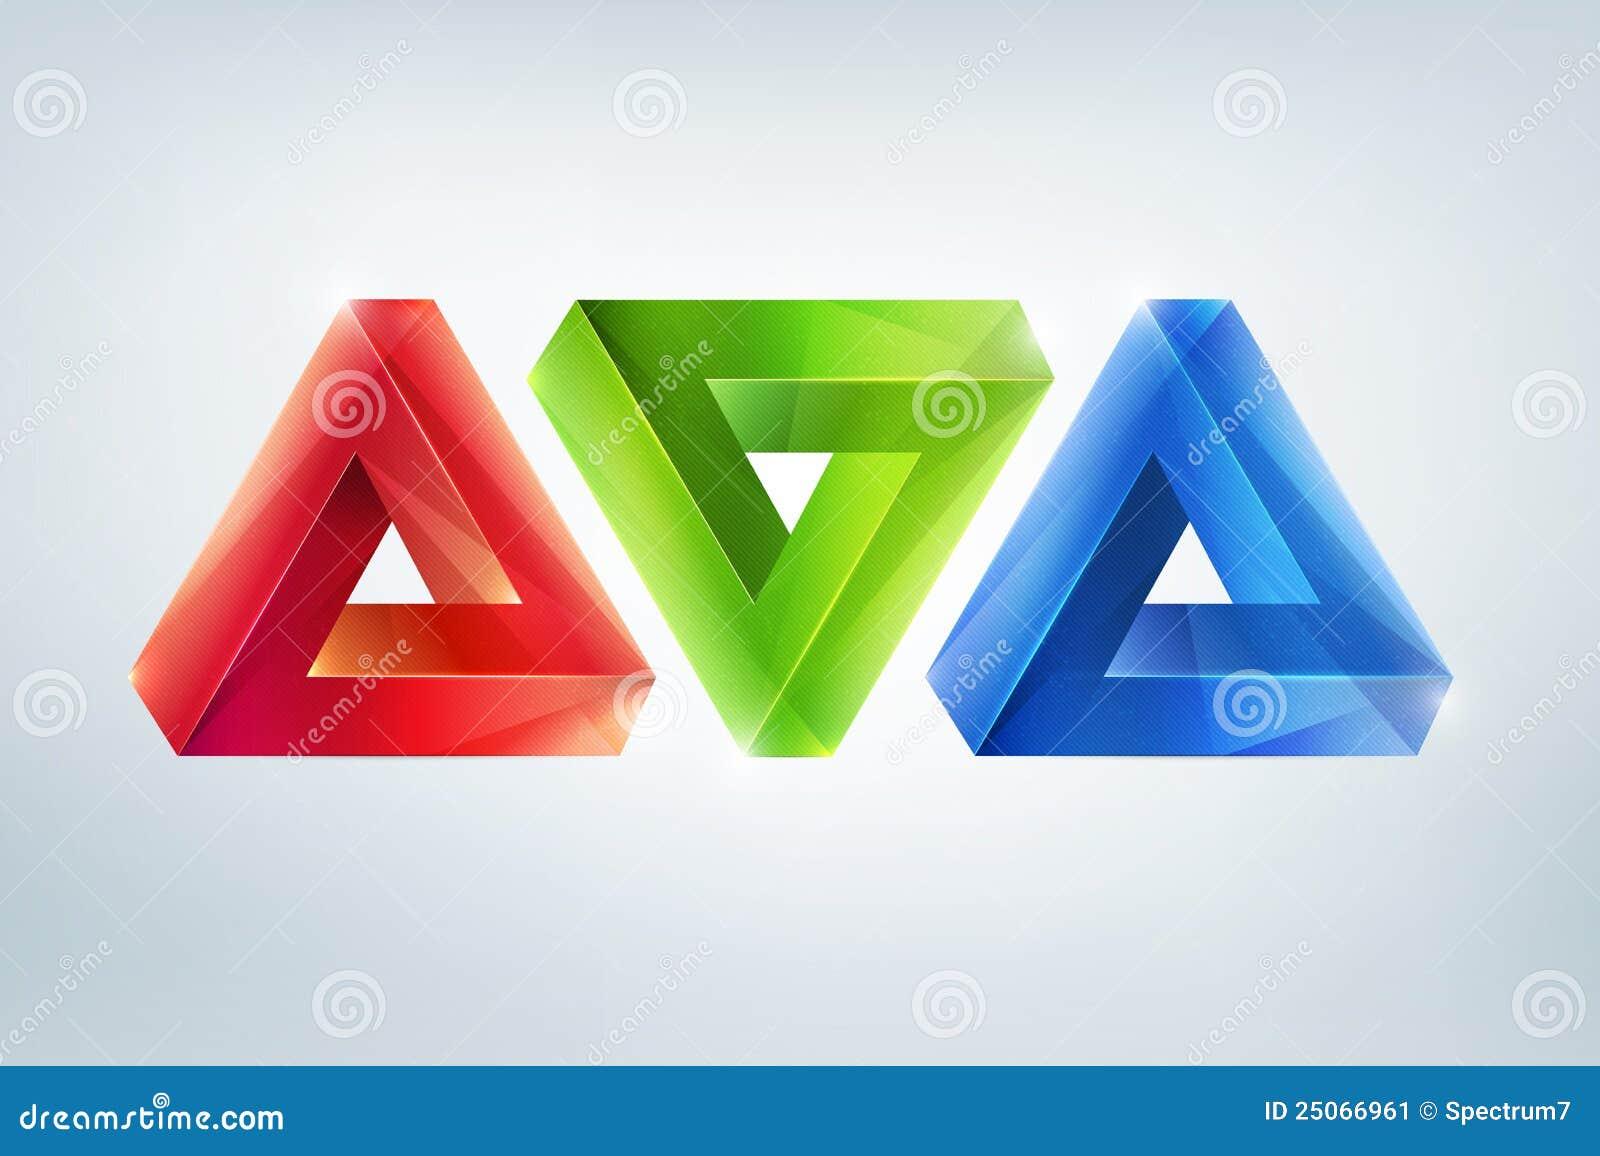 Figuras imposibles imagen de archivo imagen 25066961 - Figuras geometricas imposibles ...